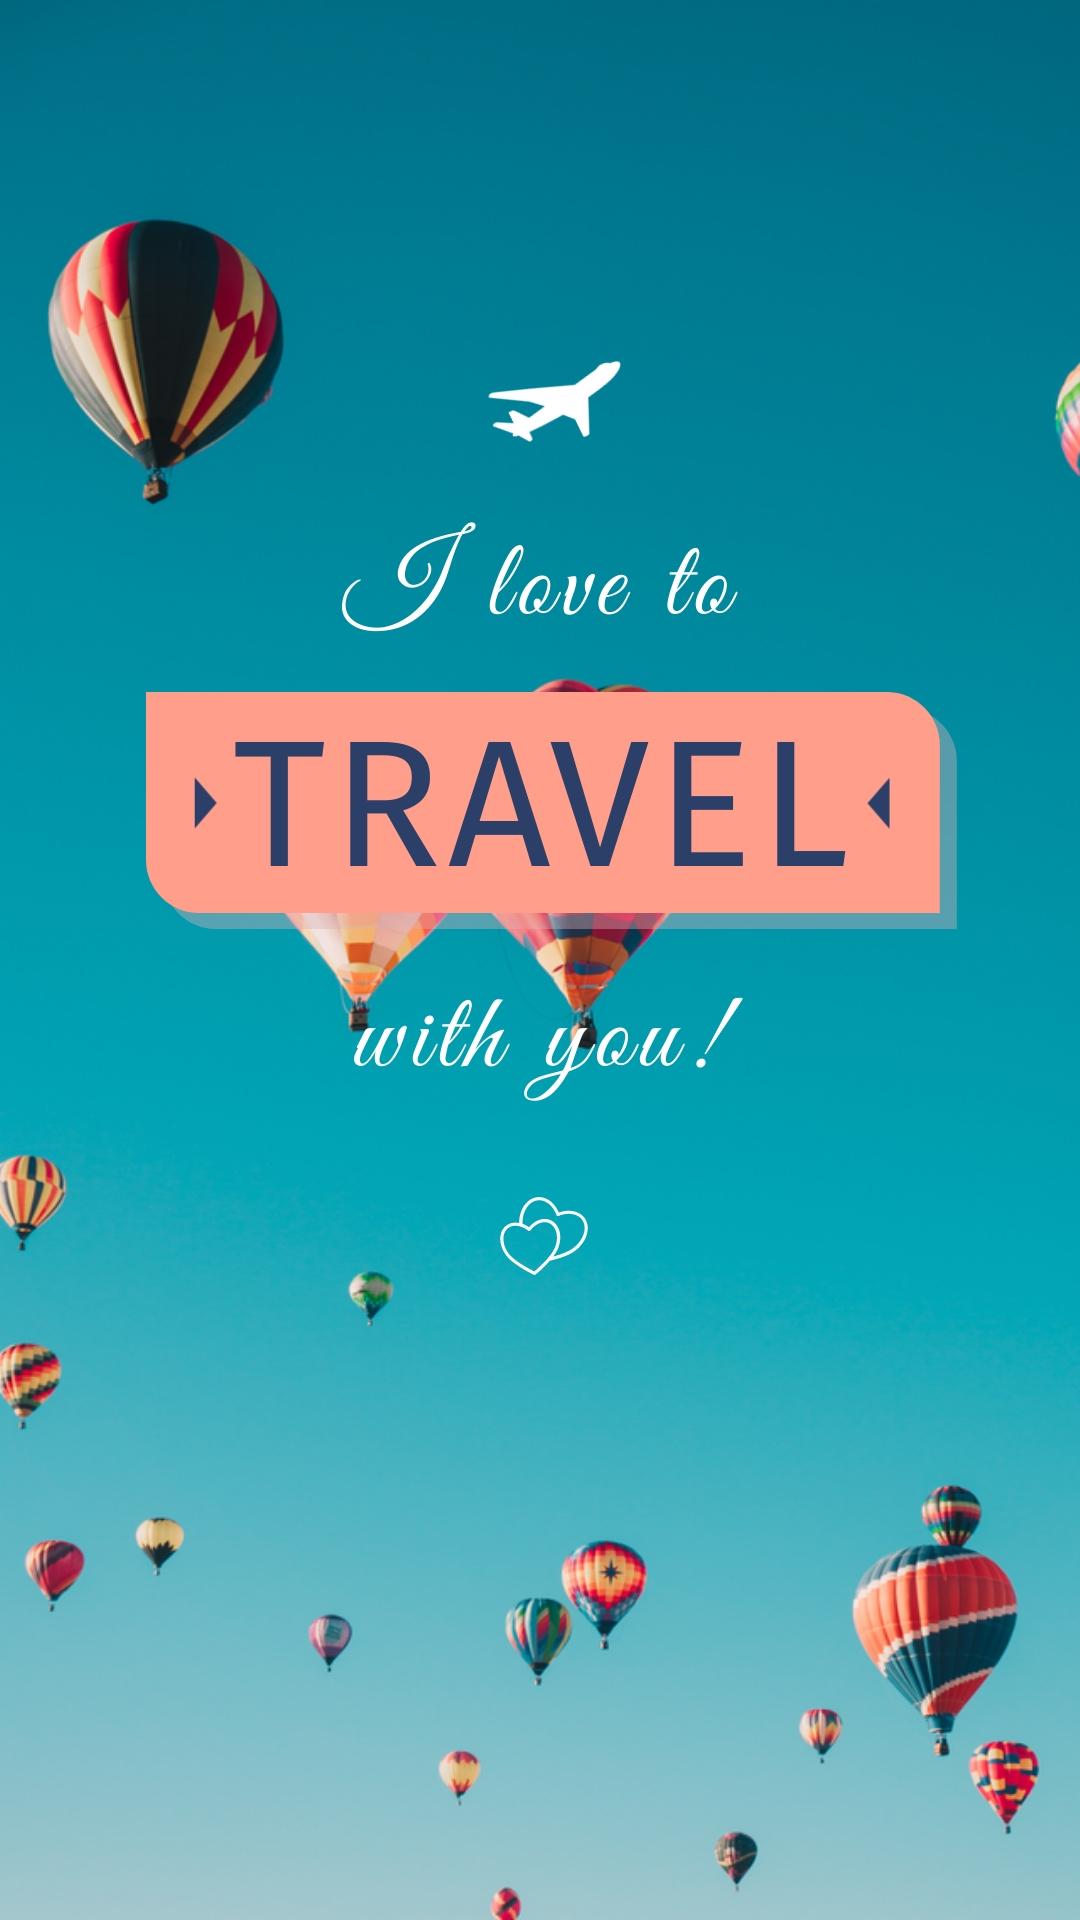 Travel Phone Wallpaper Template